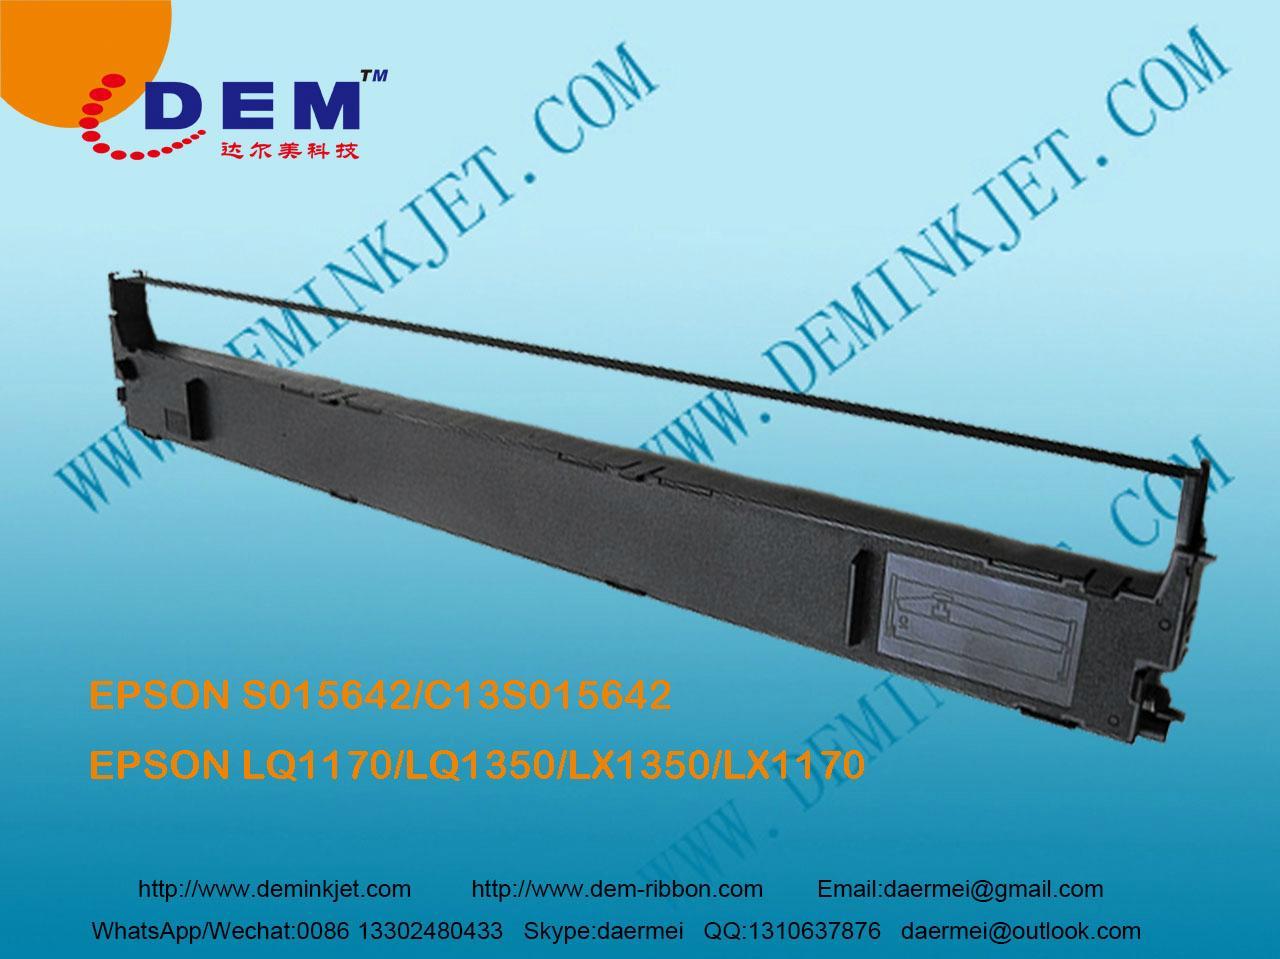 DEM EPSON S015642/C13S015642/LQ1350/LQ1170/LX1350/LX1170